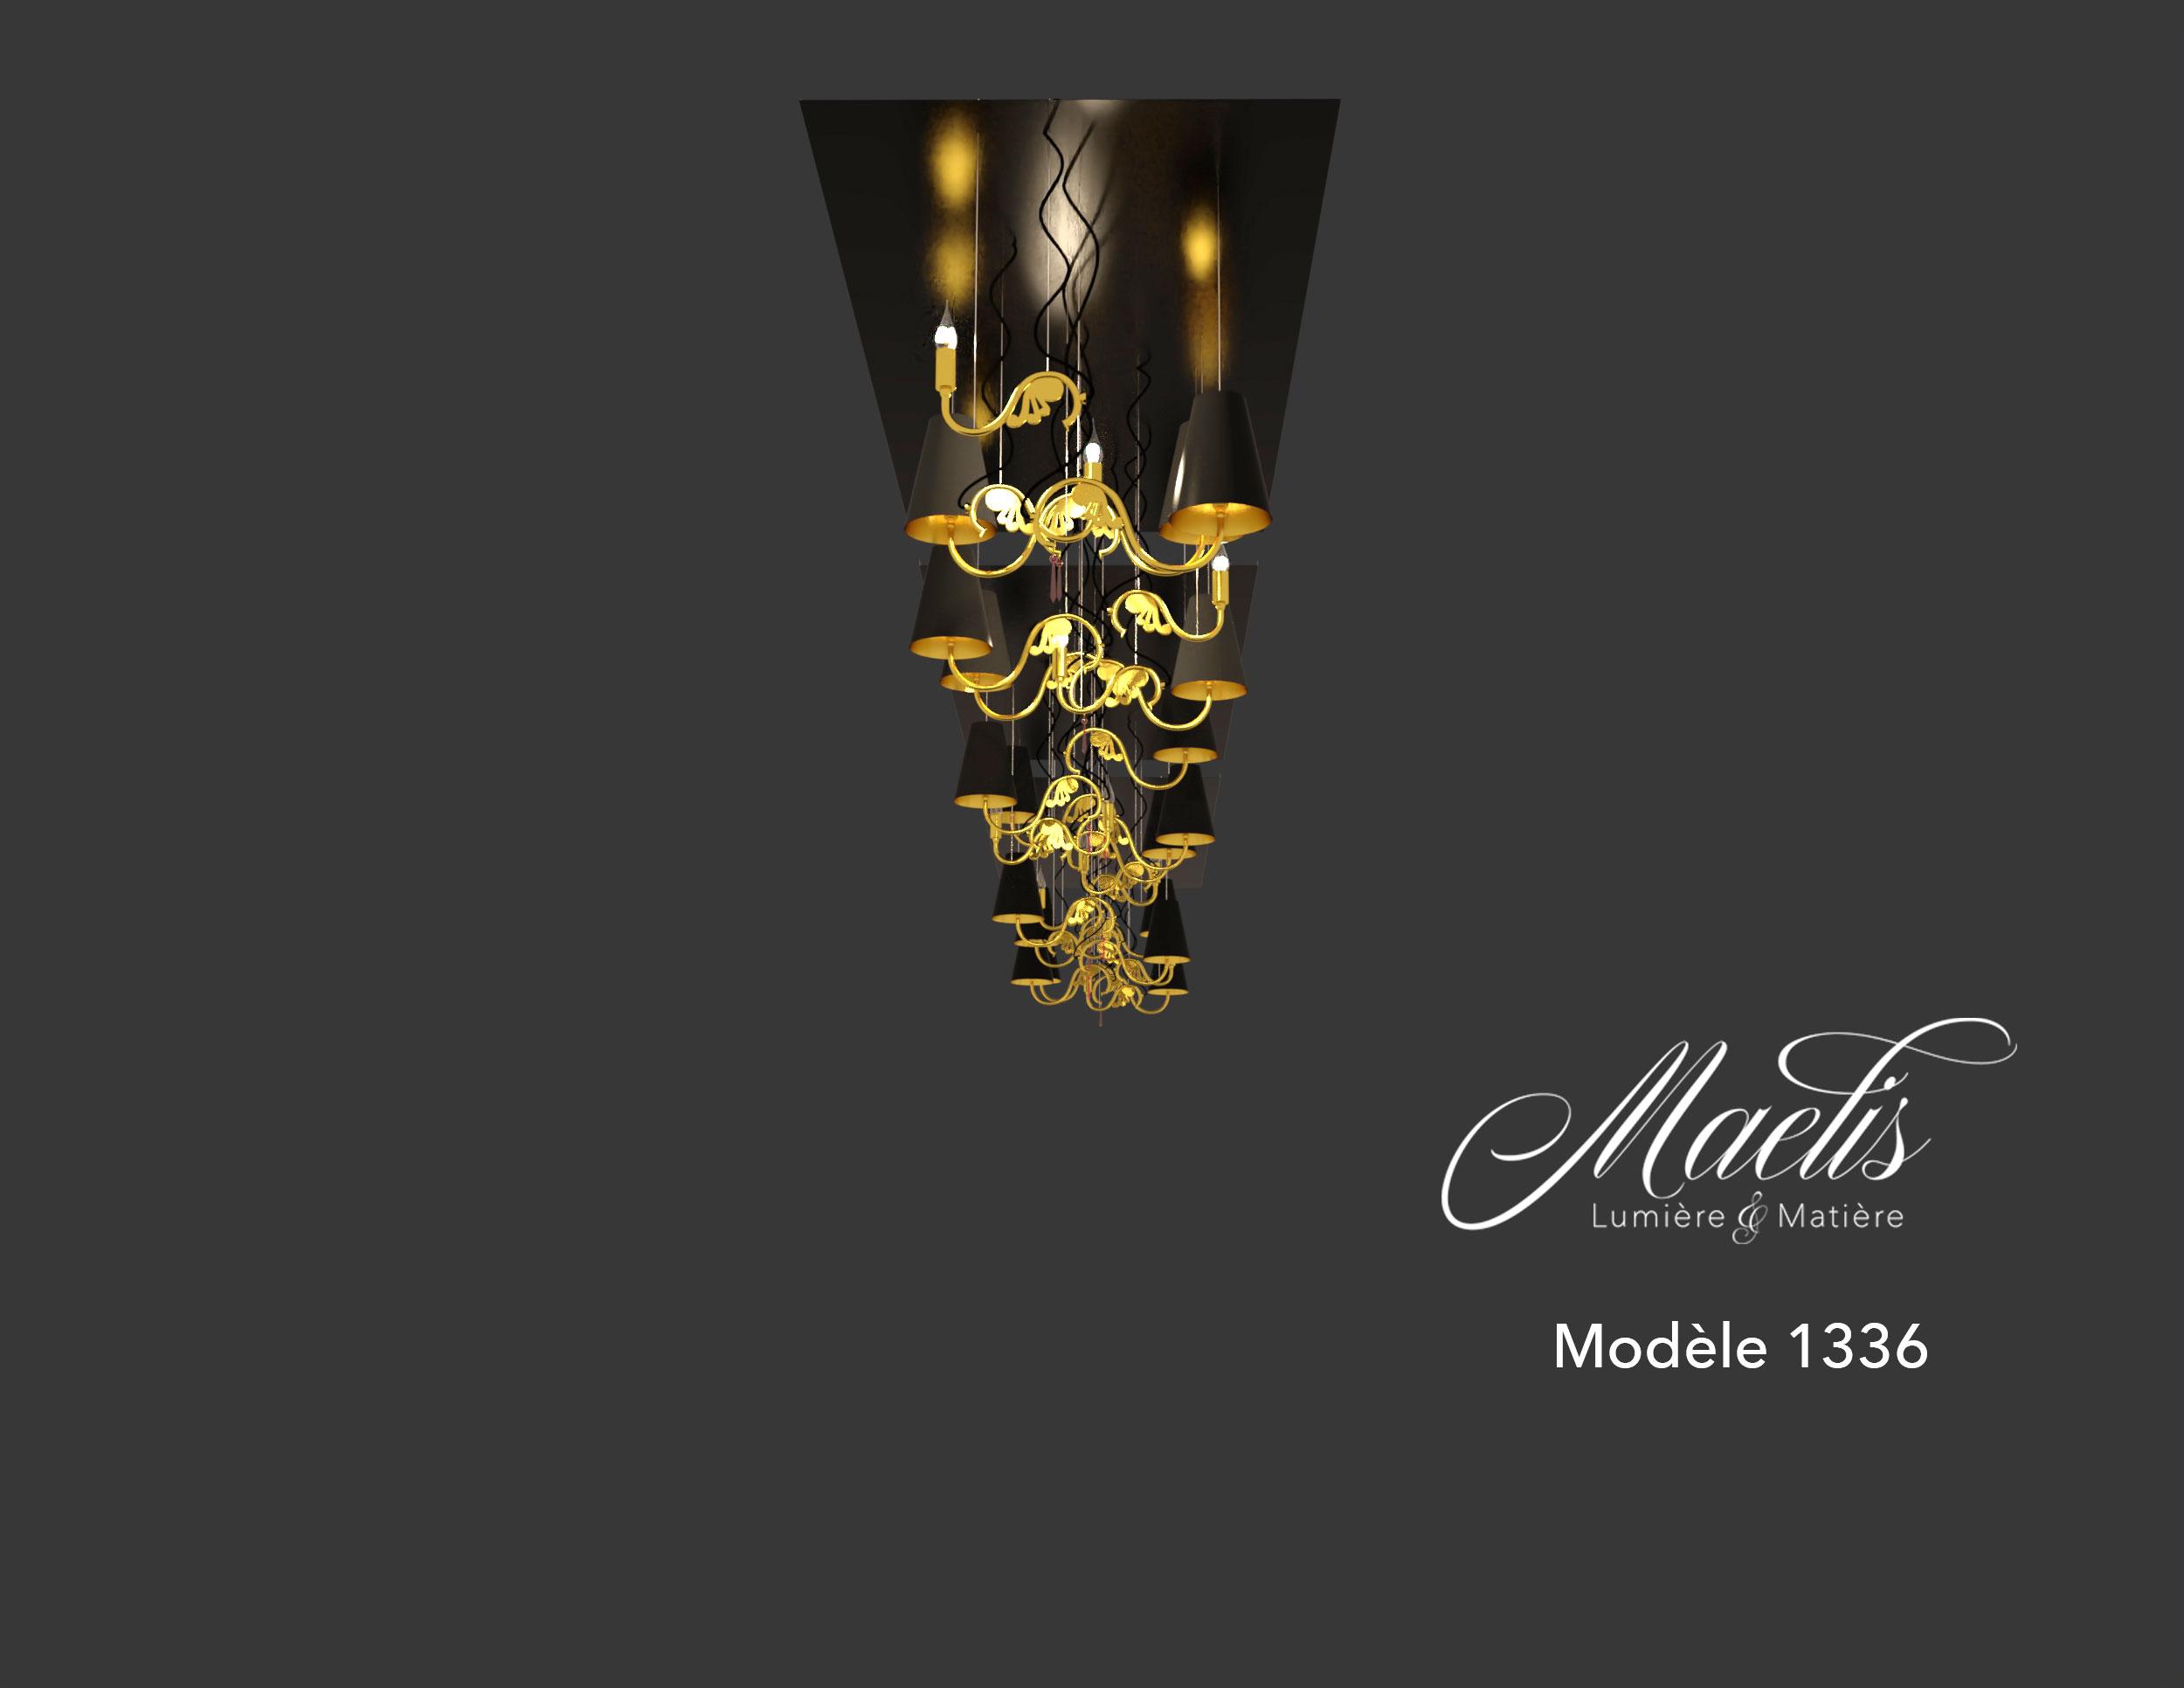 Maelis_Modèle_1336_img2